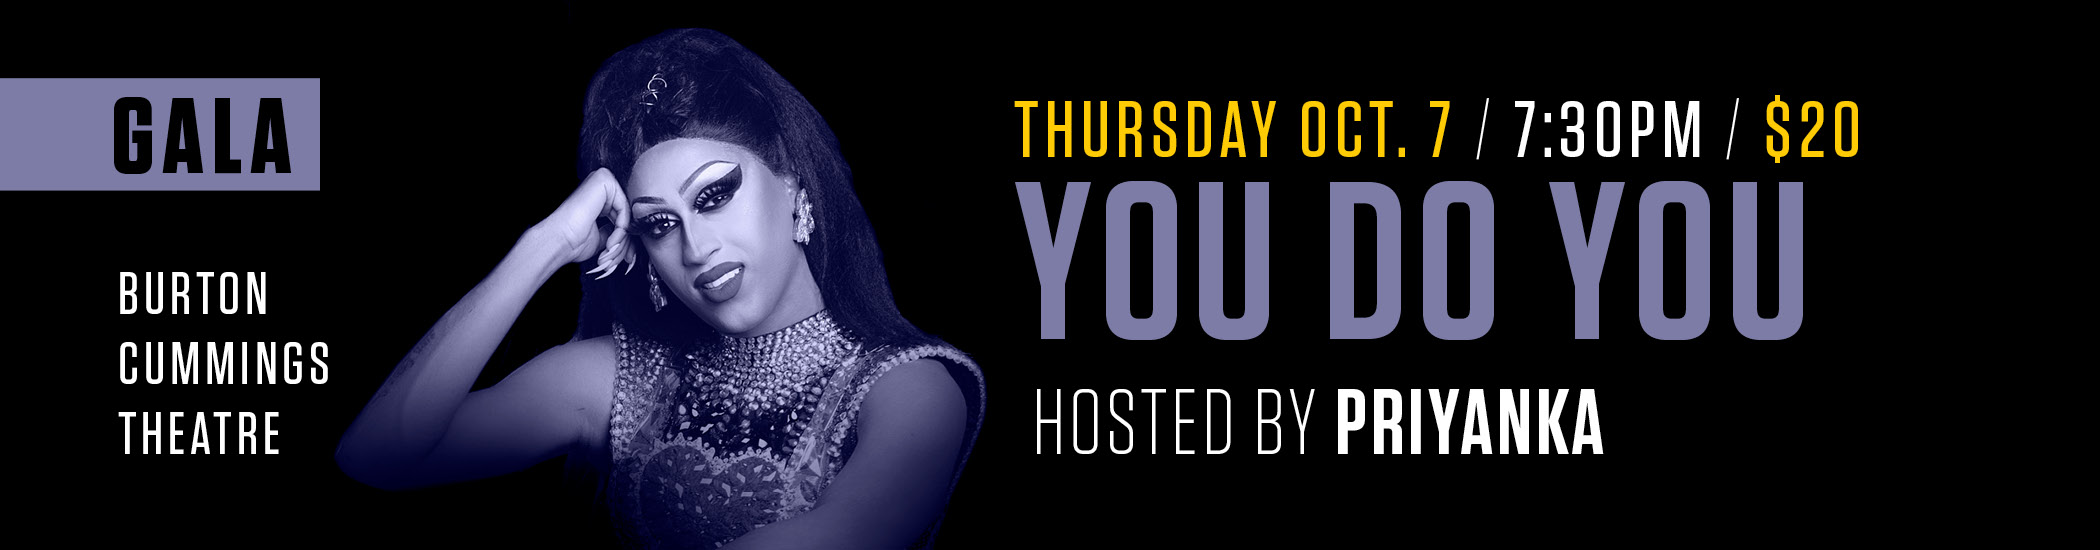 Thursday Night Gala